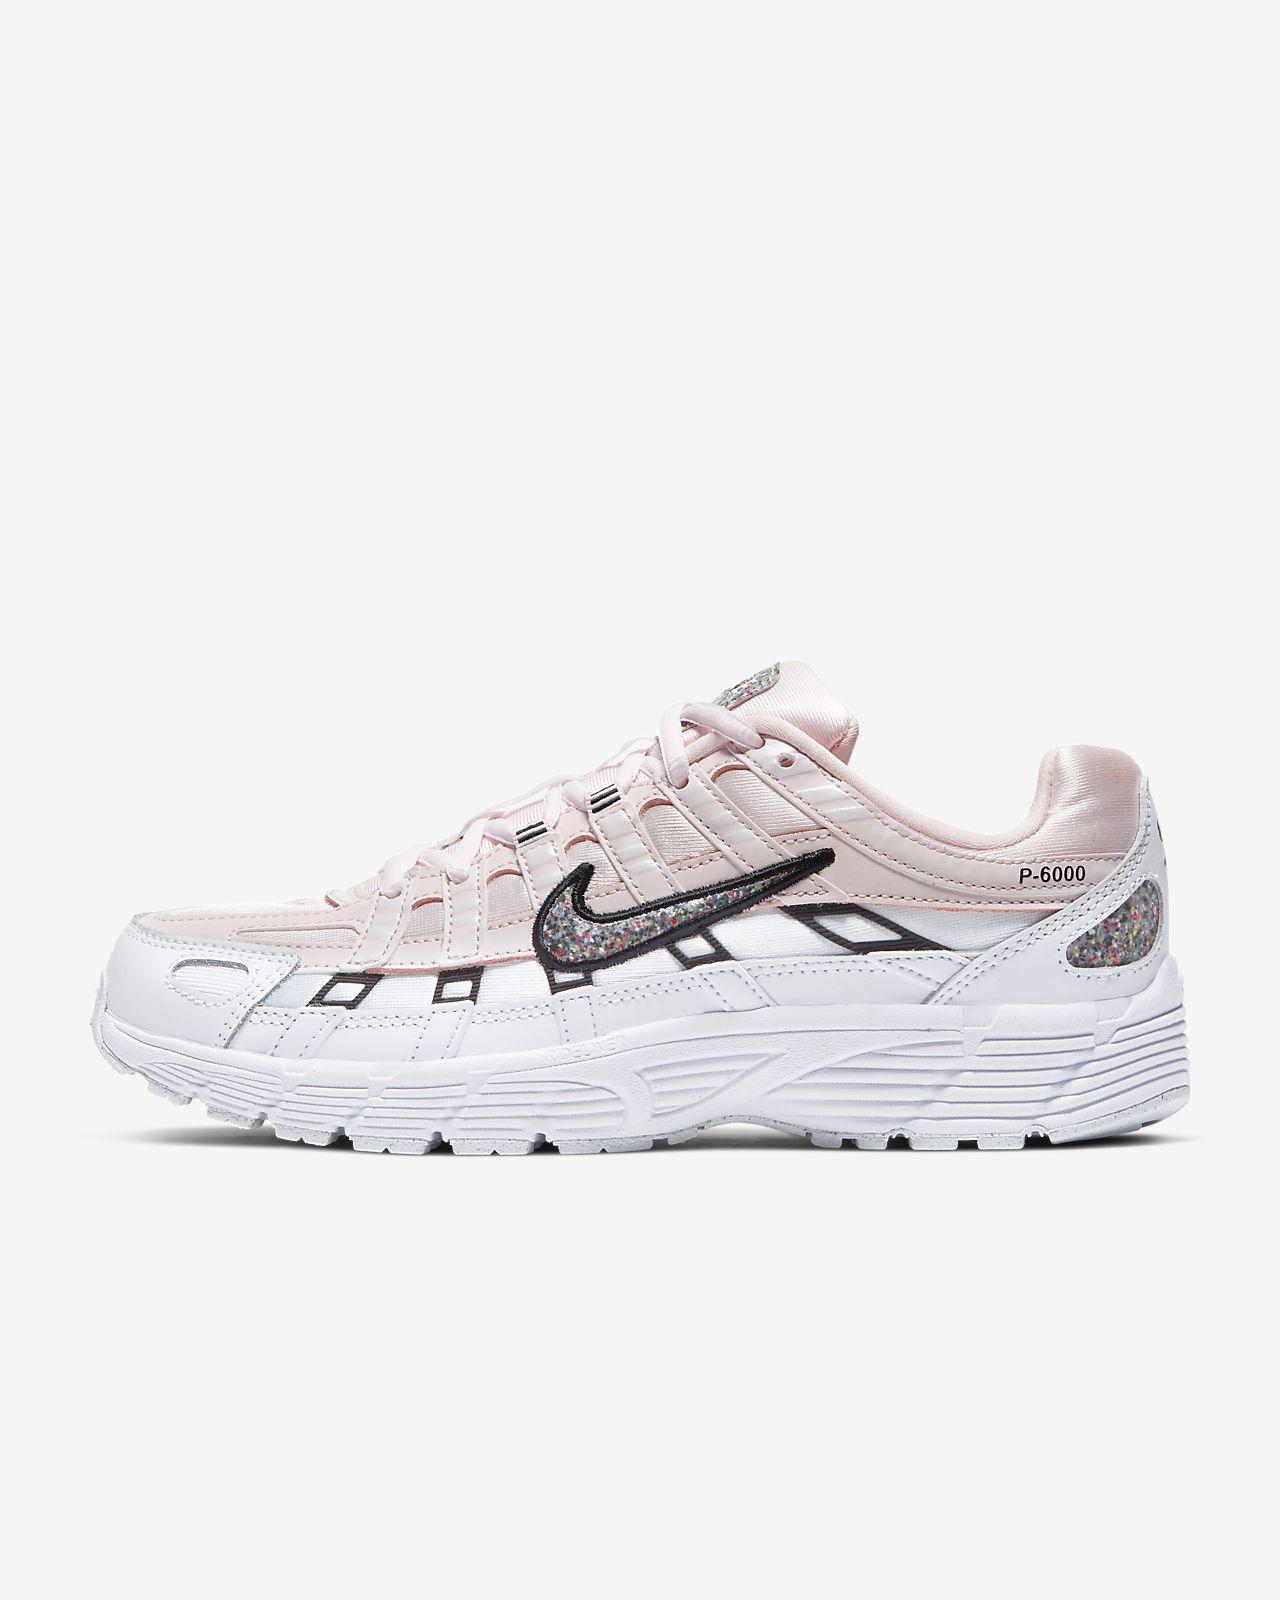 Se Femme 6000 Pour Chaussure Nike P nmN80vw